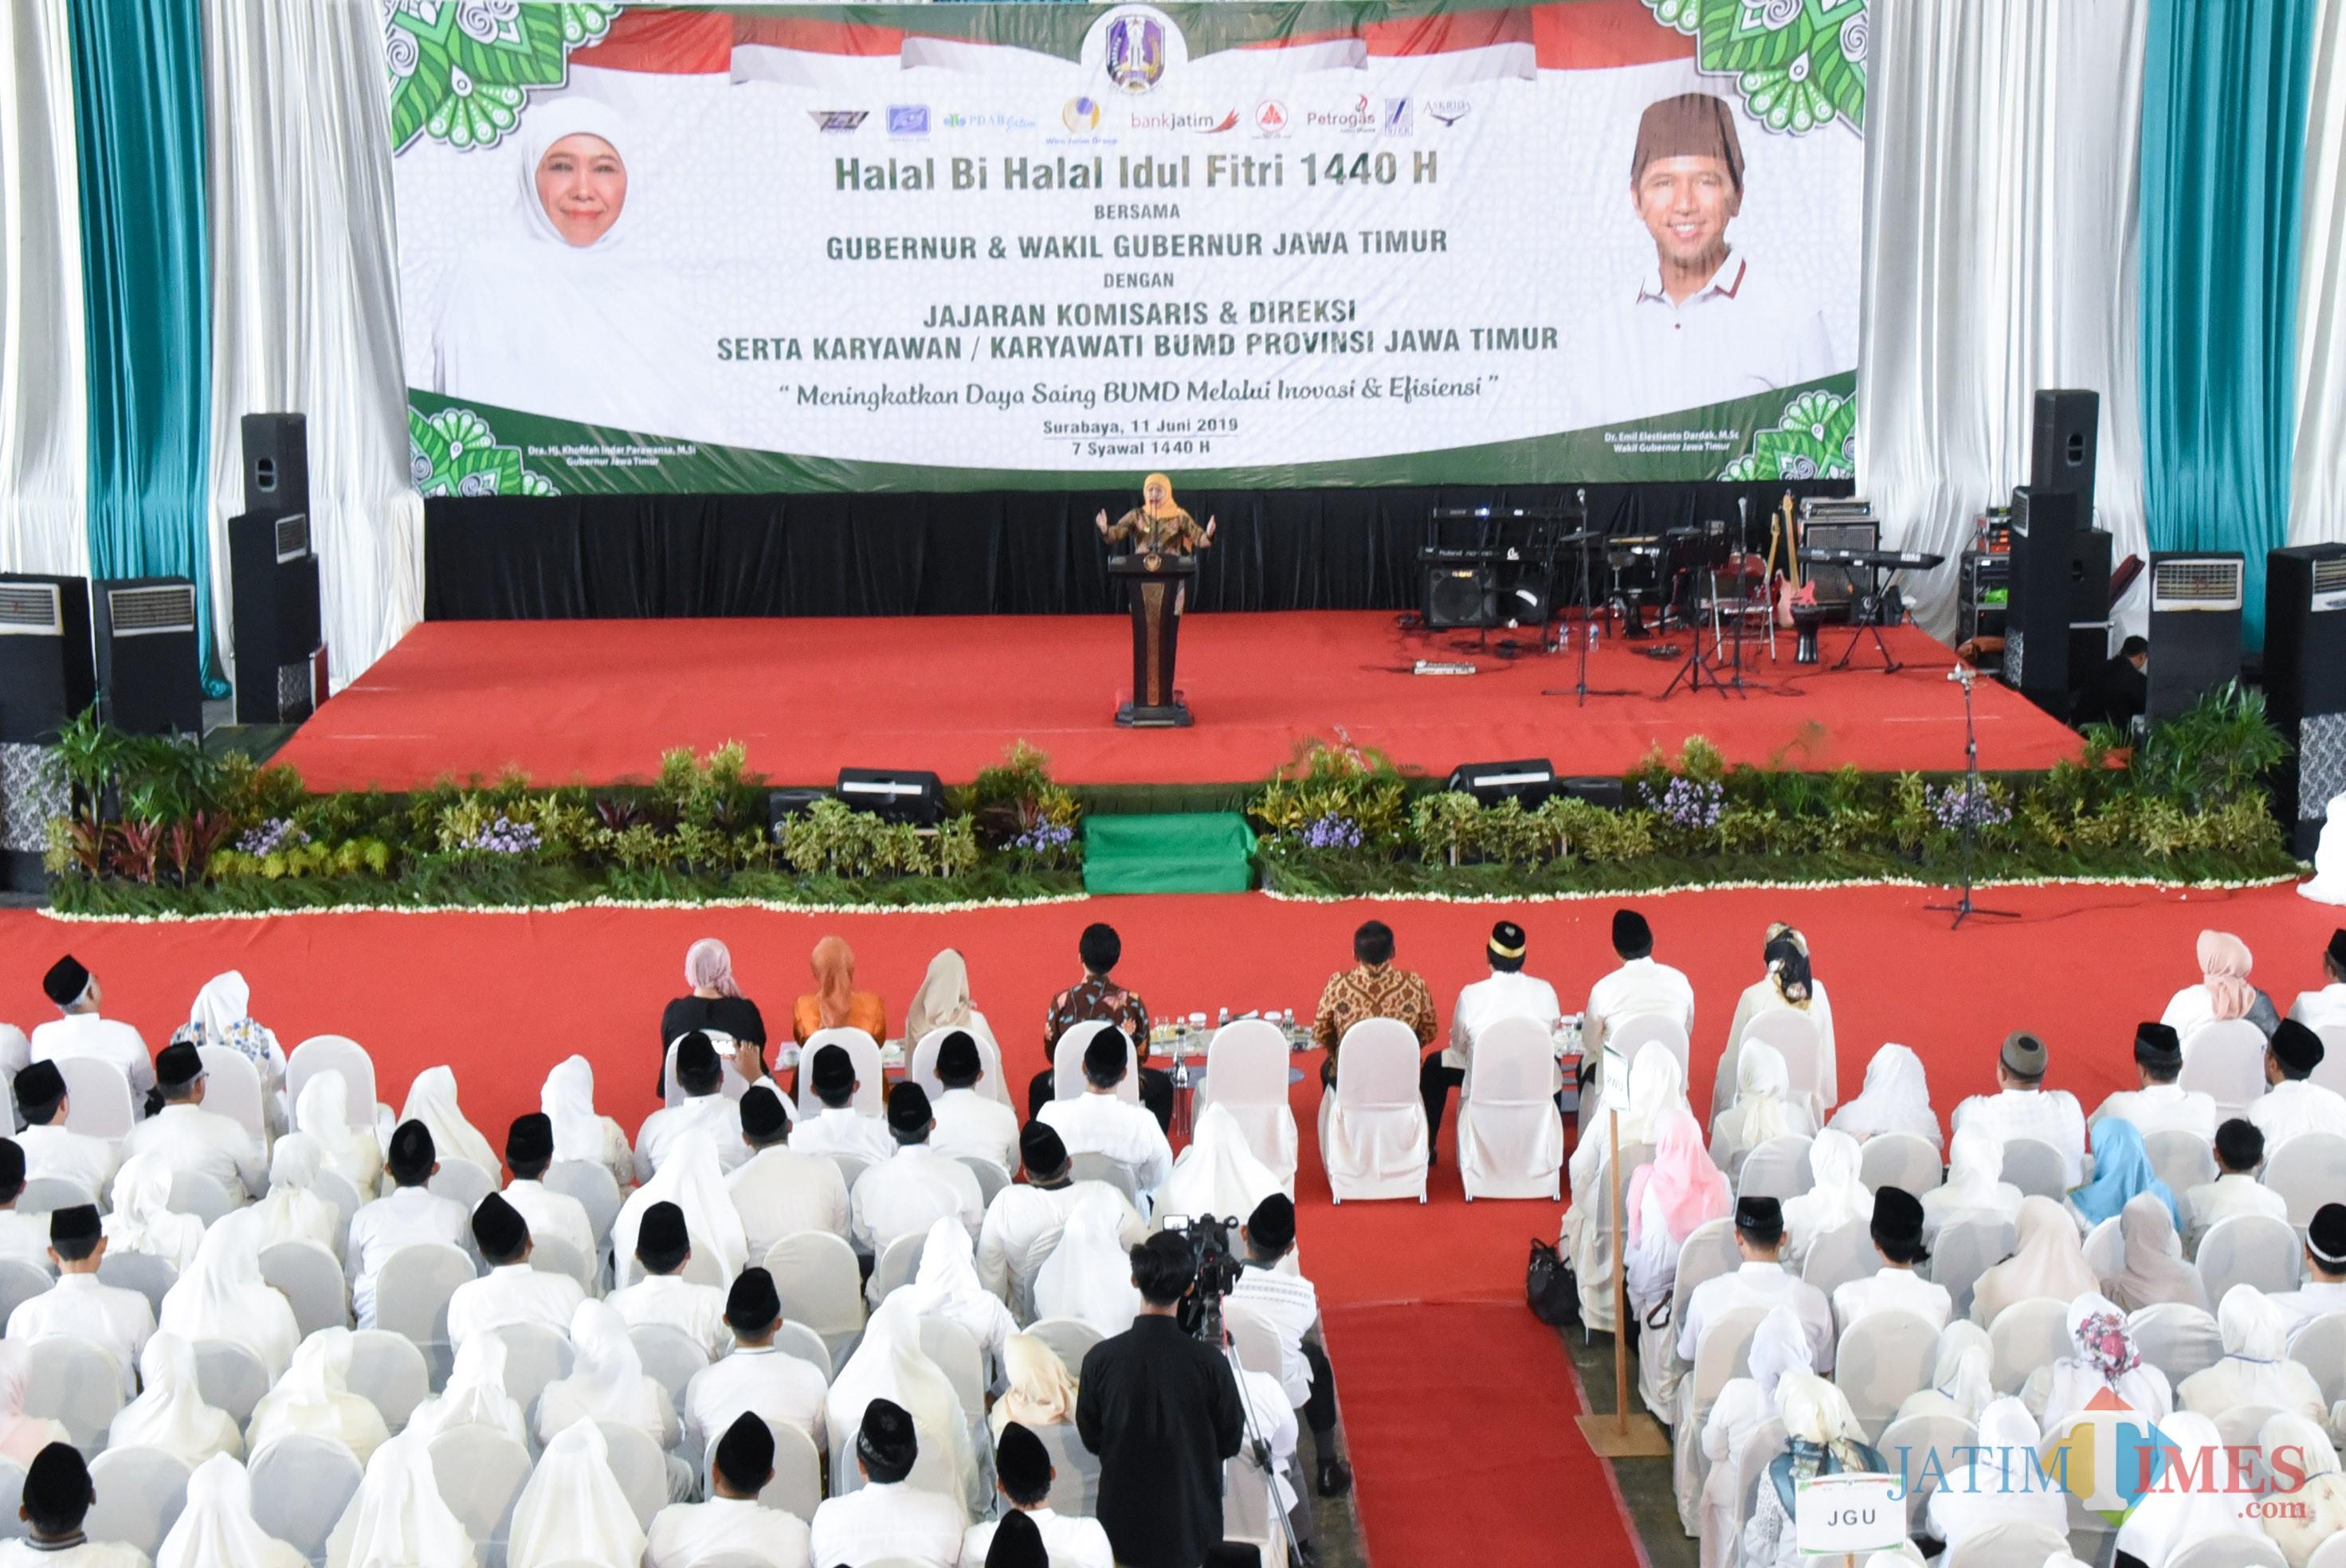 Gubernur Jatim Khofifah ketika silaturahmi bareng karyawan BUMD Jatim.